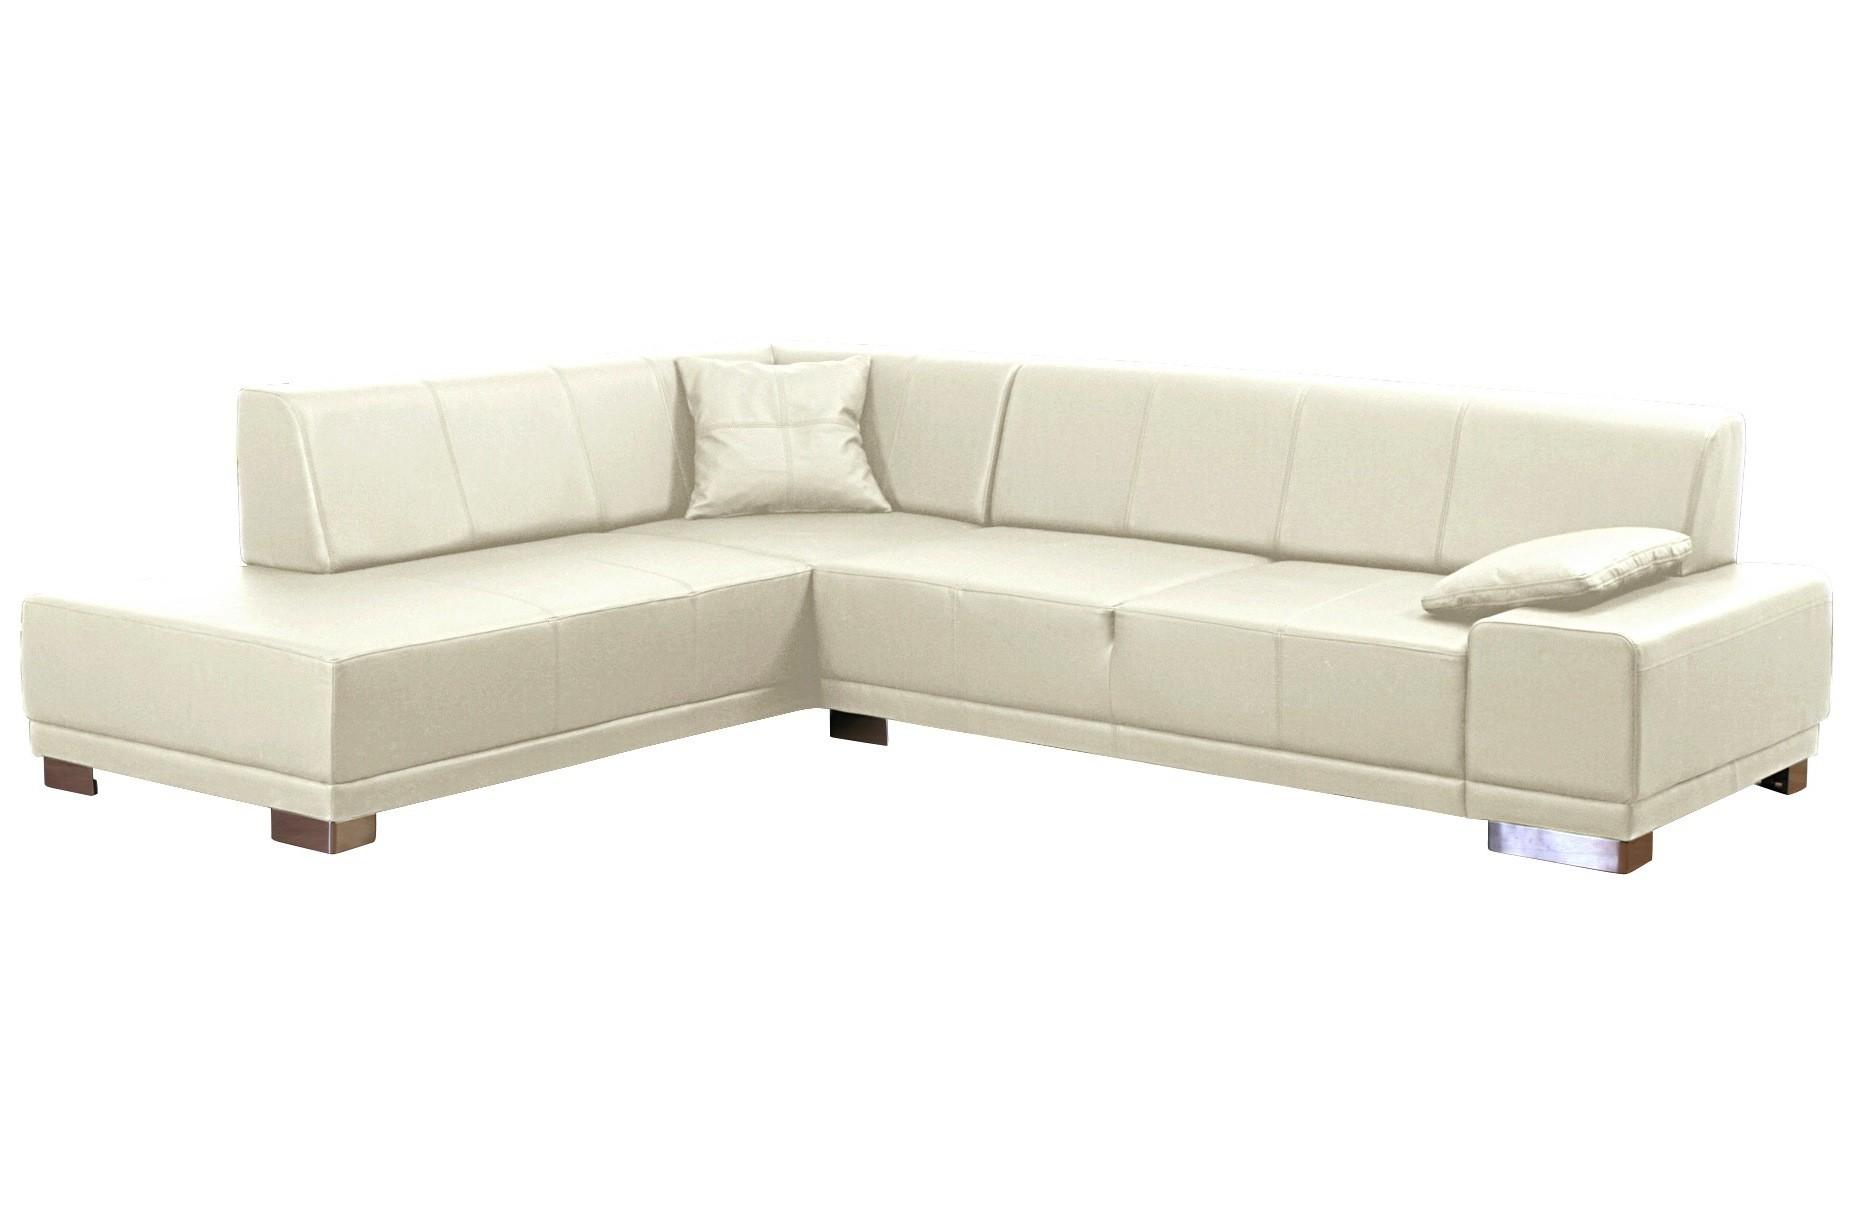 ecksofa weiss leder ecksofa leder kleines braun ecksofa leder chesterfield. Black Bedroom Furniture Sets. Home Design Ideas